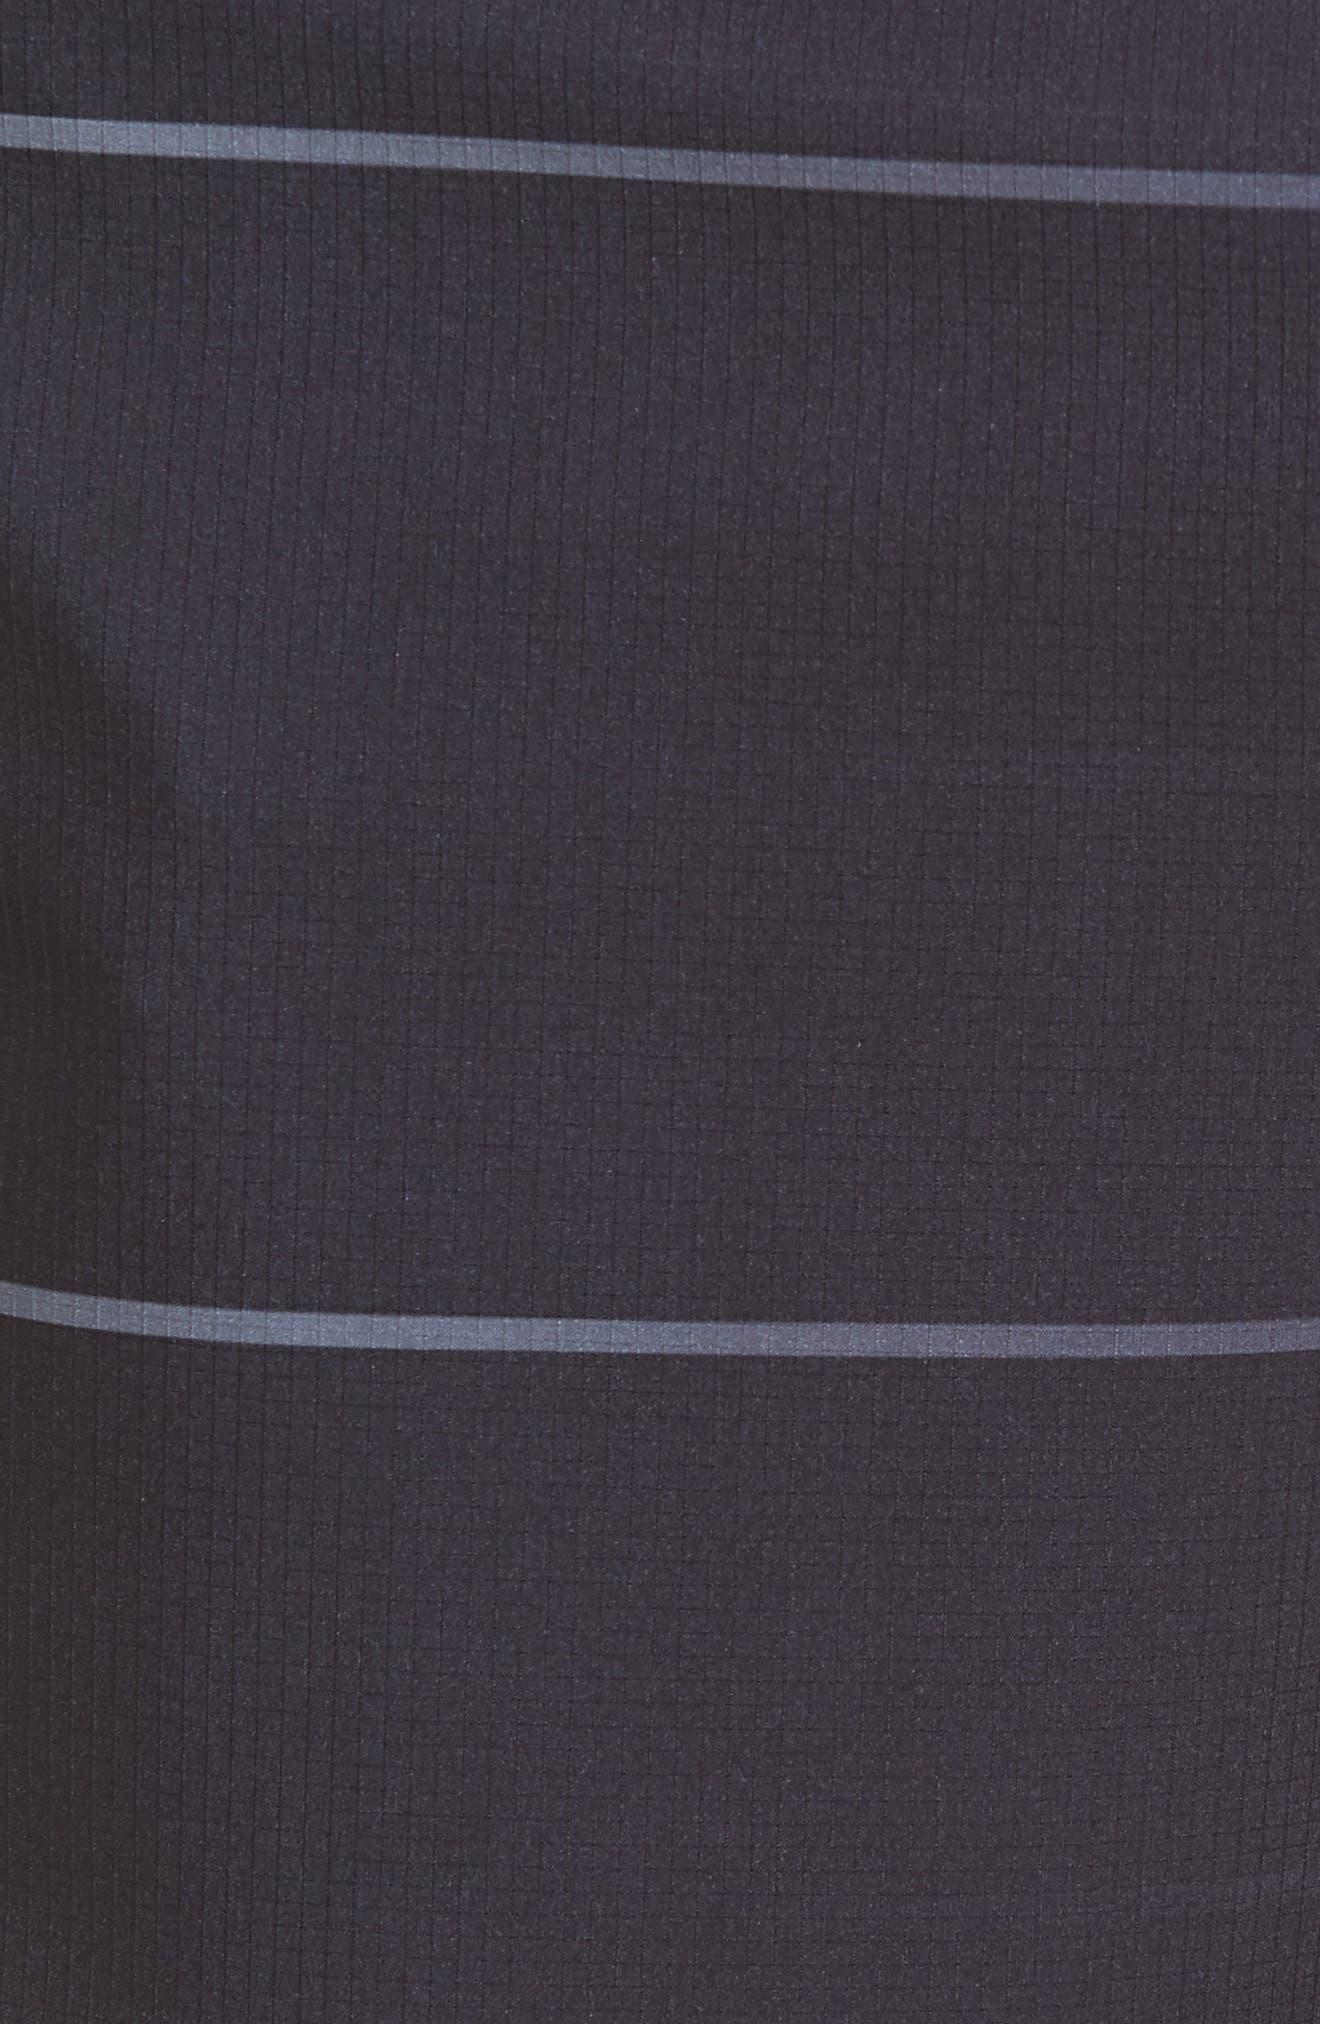 Alpha Trainer Stripe Shorts,                             Alternate thumbnail 5, color,                             010